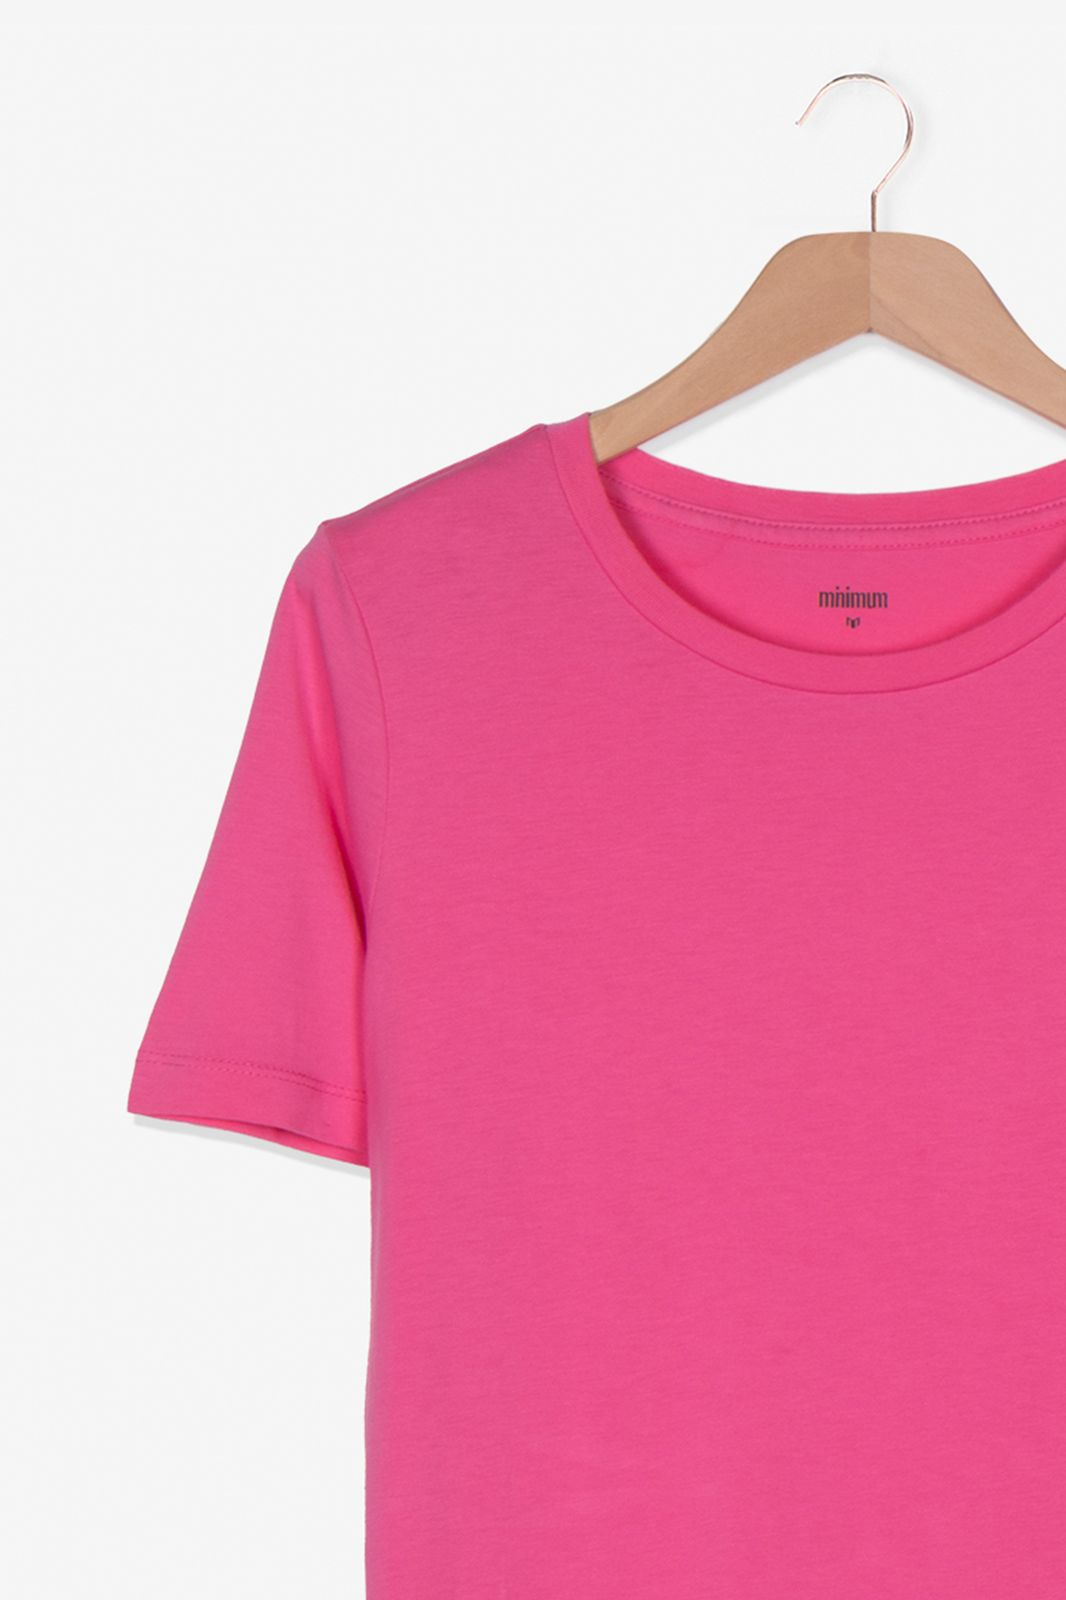 Minimum roze t-shirt ronde hals - Dames   Sissy-Boy